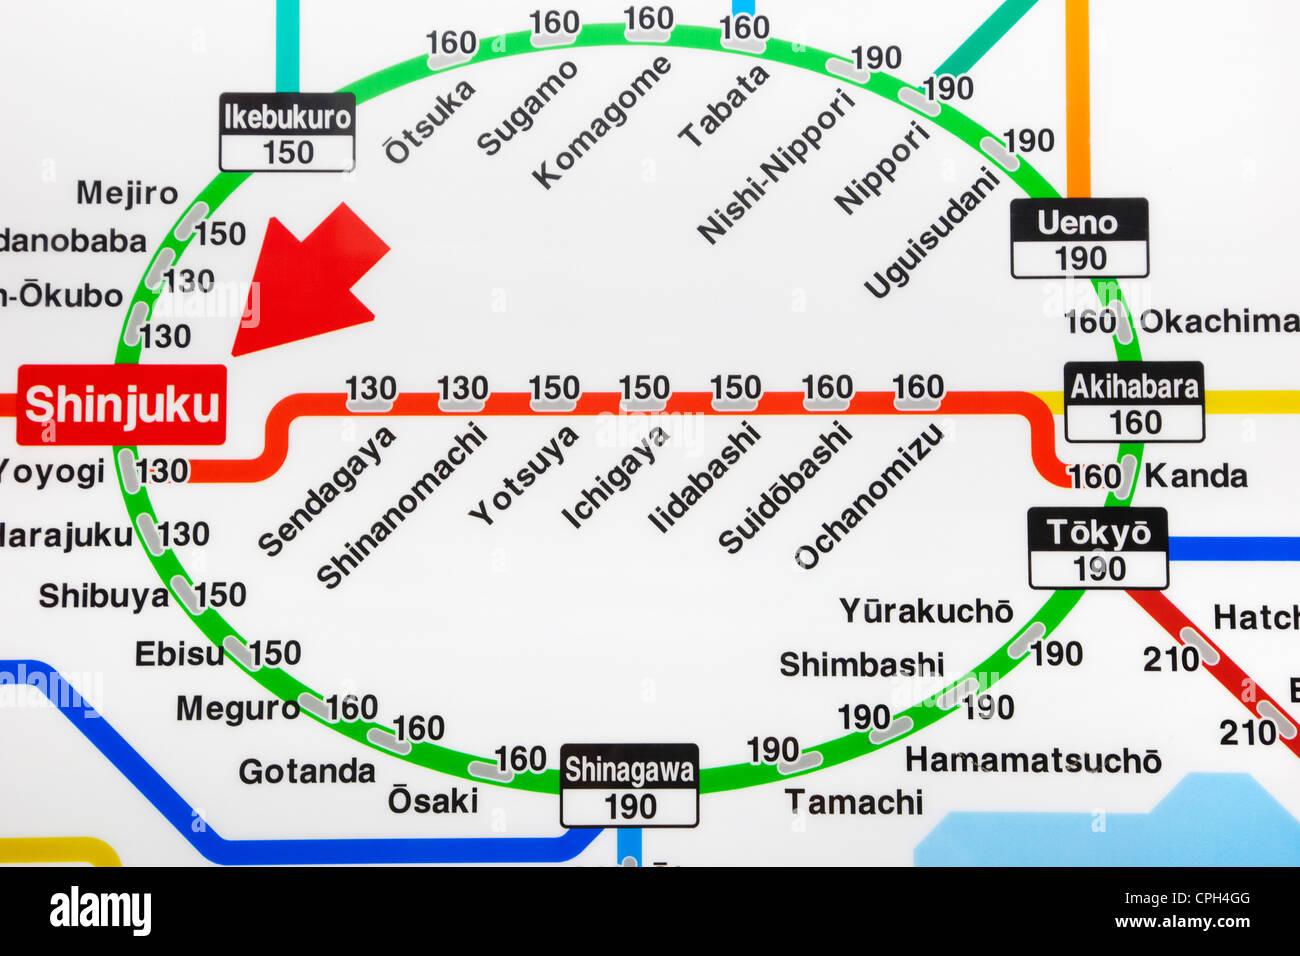 Tokyo Jr Subway Map.Asia Japan Tokyo Train Map Tokyo Railway Map Jr Japan Railways Stock Photo Alamy